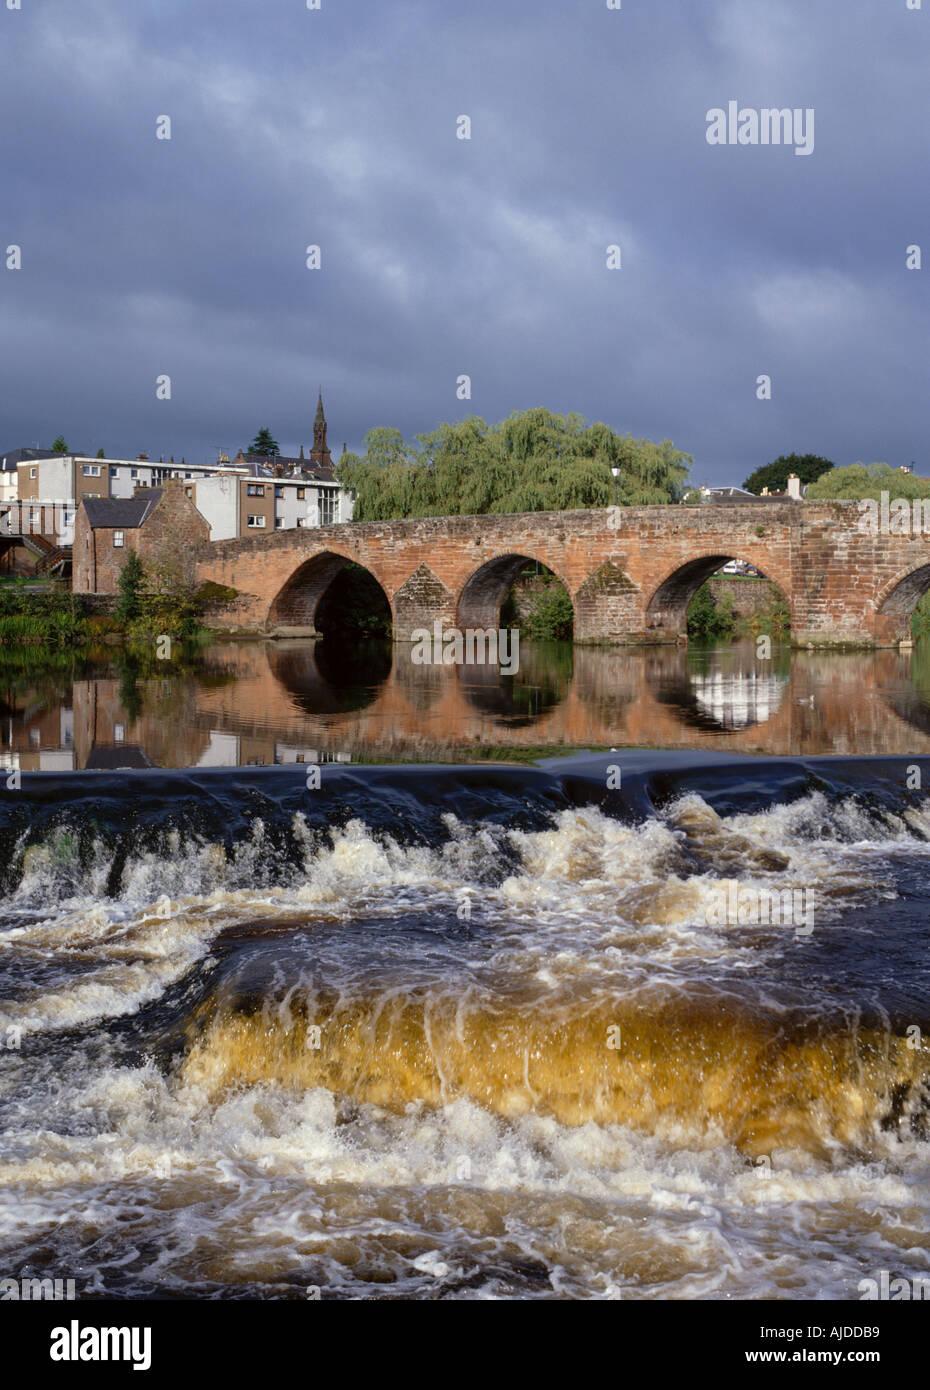 dh Devorgilla bridge DUMFRIES GALLOWAY Multiple stone arch bridge across River Nith Stock Photo